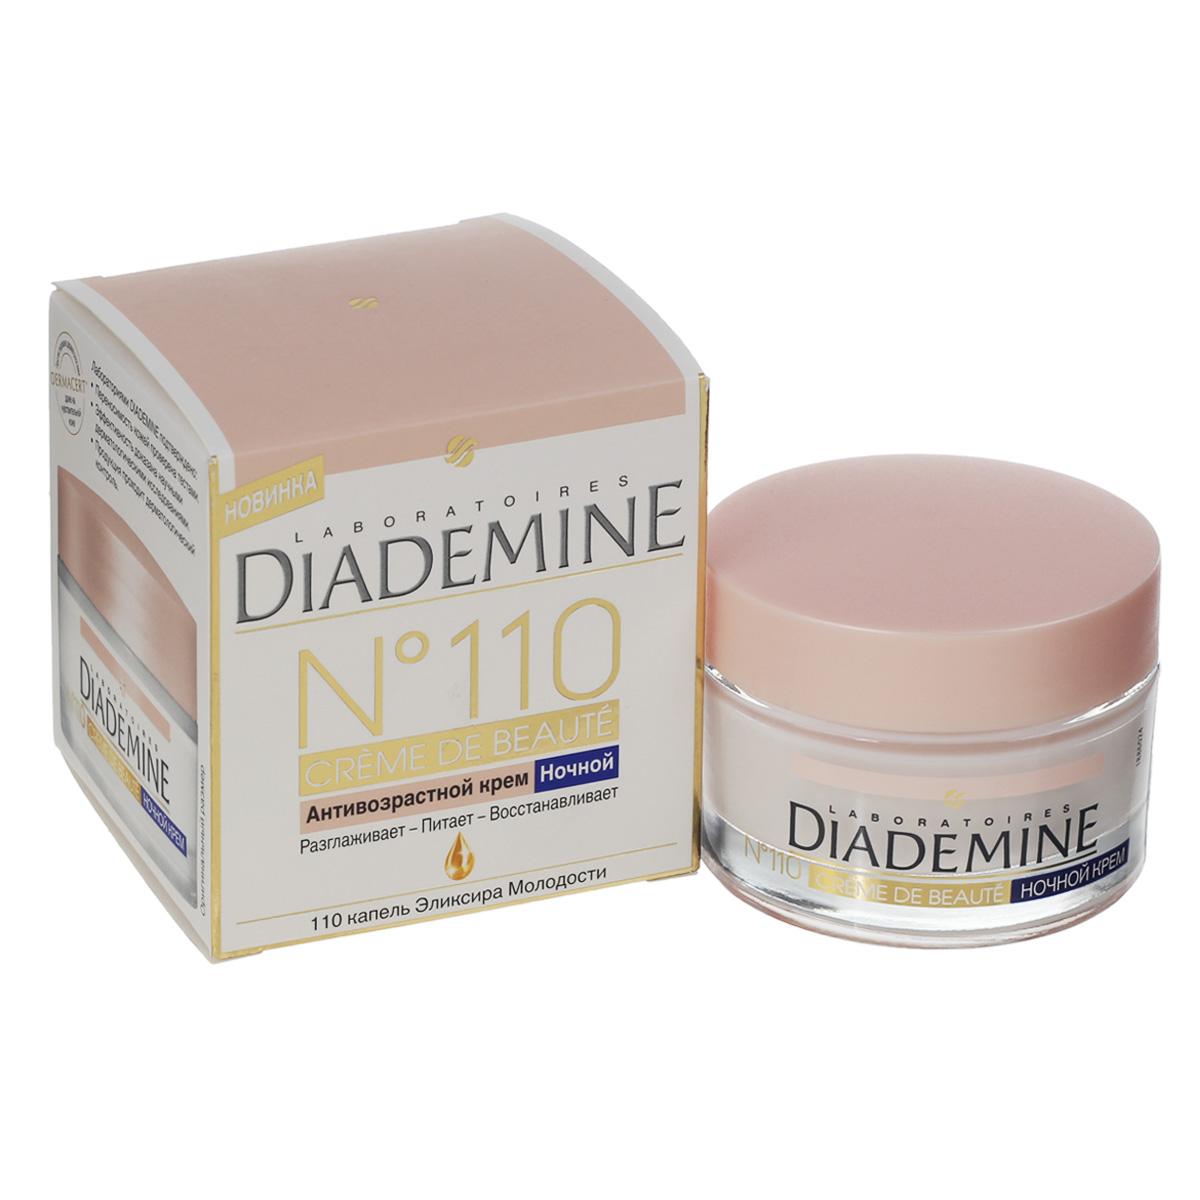 DIADEMINE №110 Creme de Beaute Антивозрастной ночной крем, 50 мл diademine lift superfiller разглаживание морщин крем концентрат 30 мл